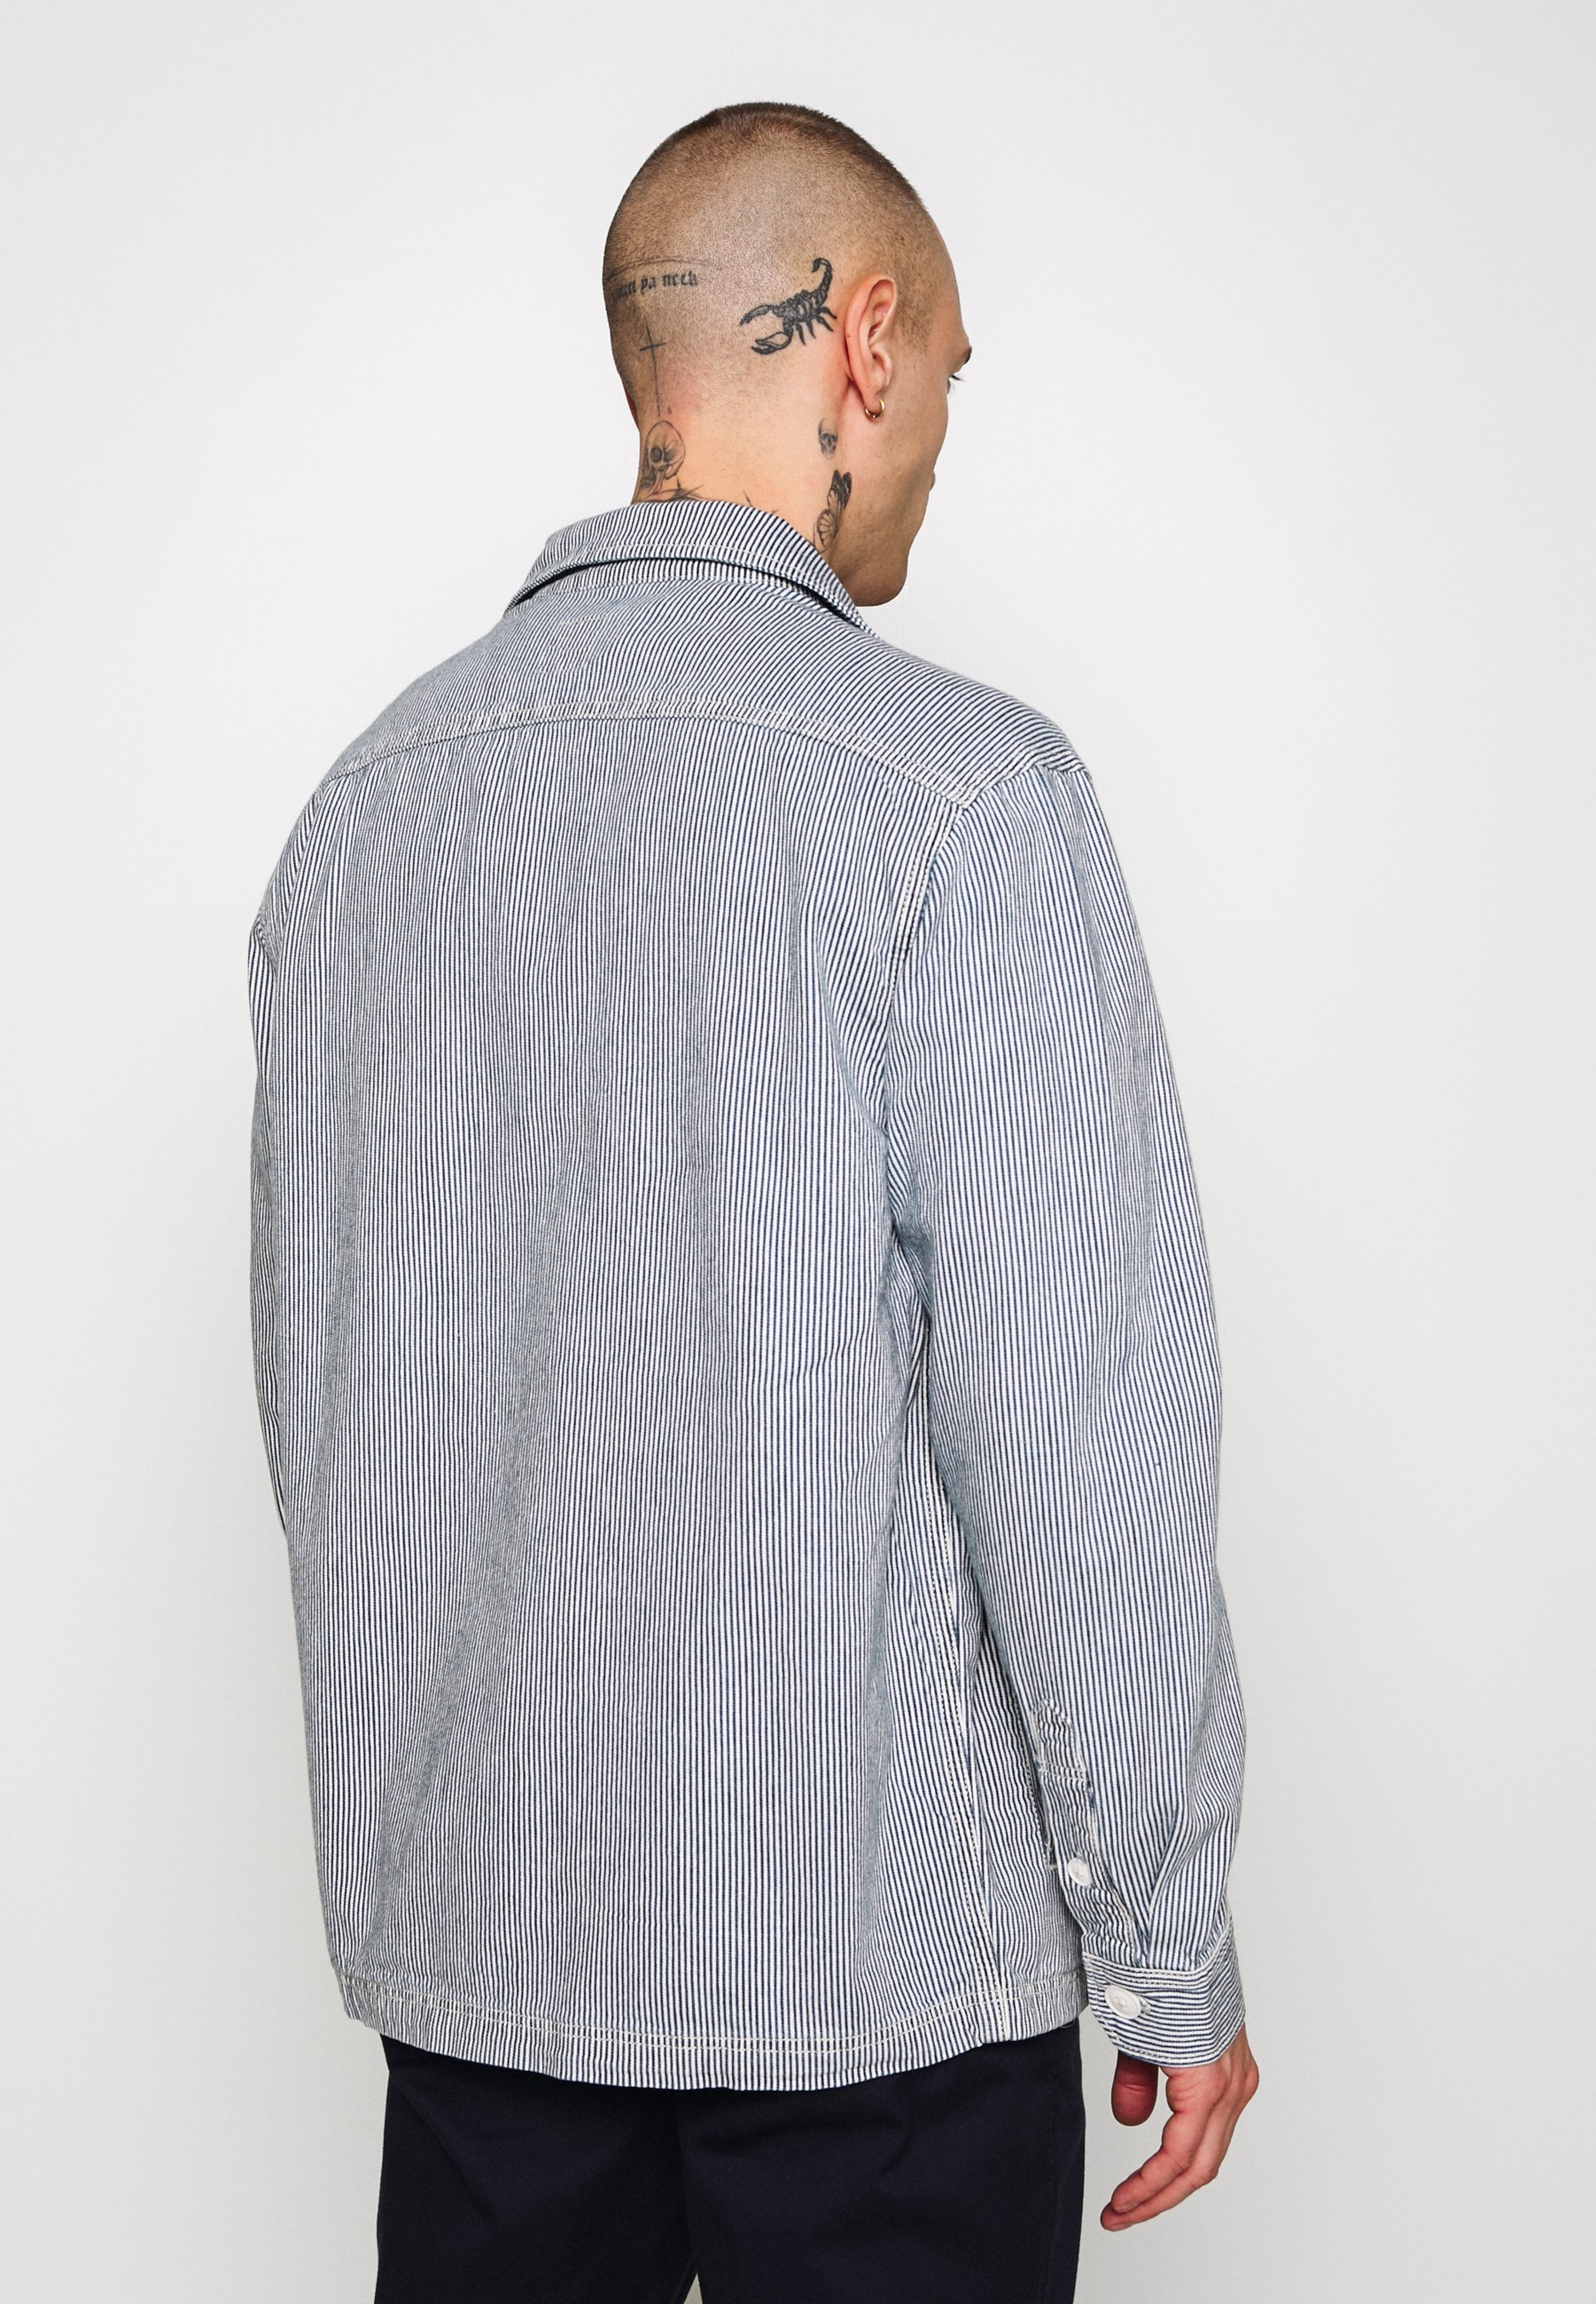 Lee Workwear - Camicia Summer Wash o9XjL